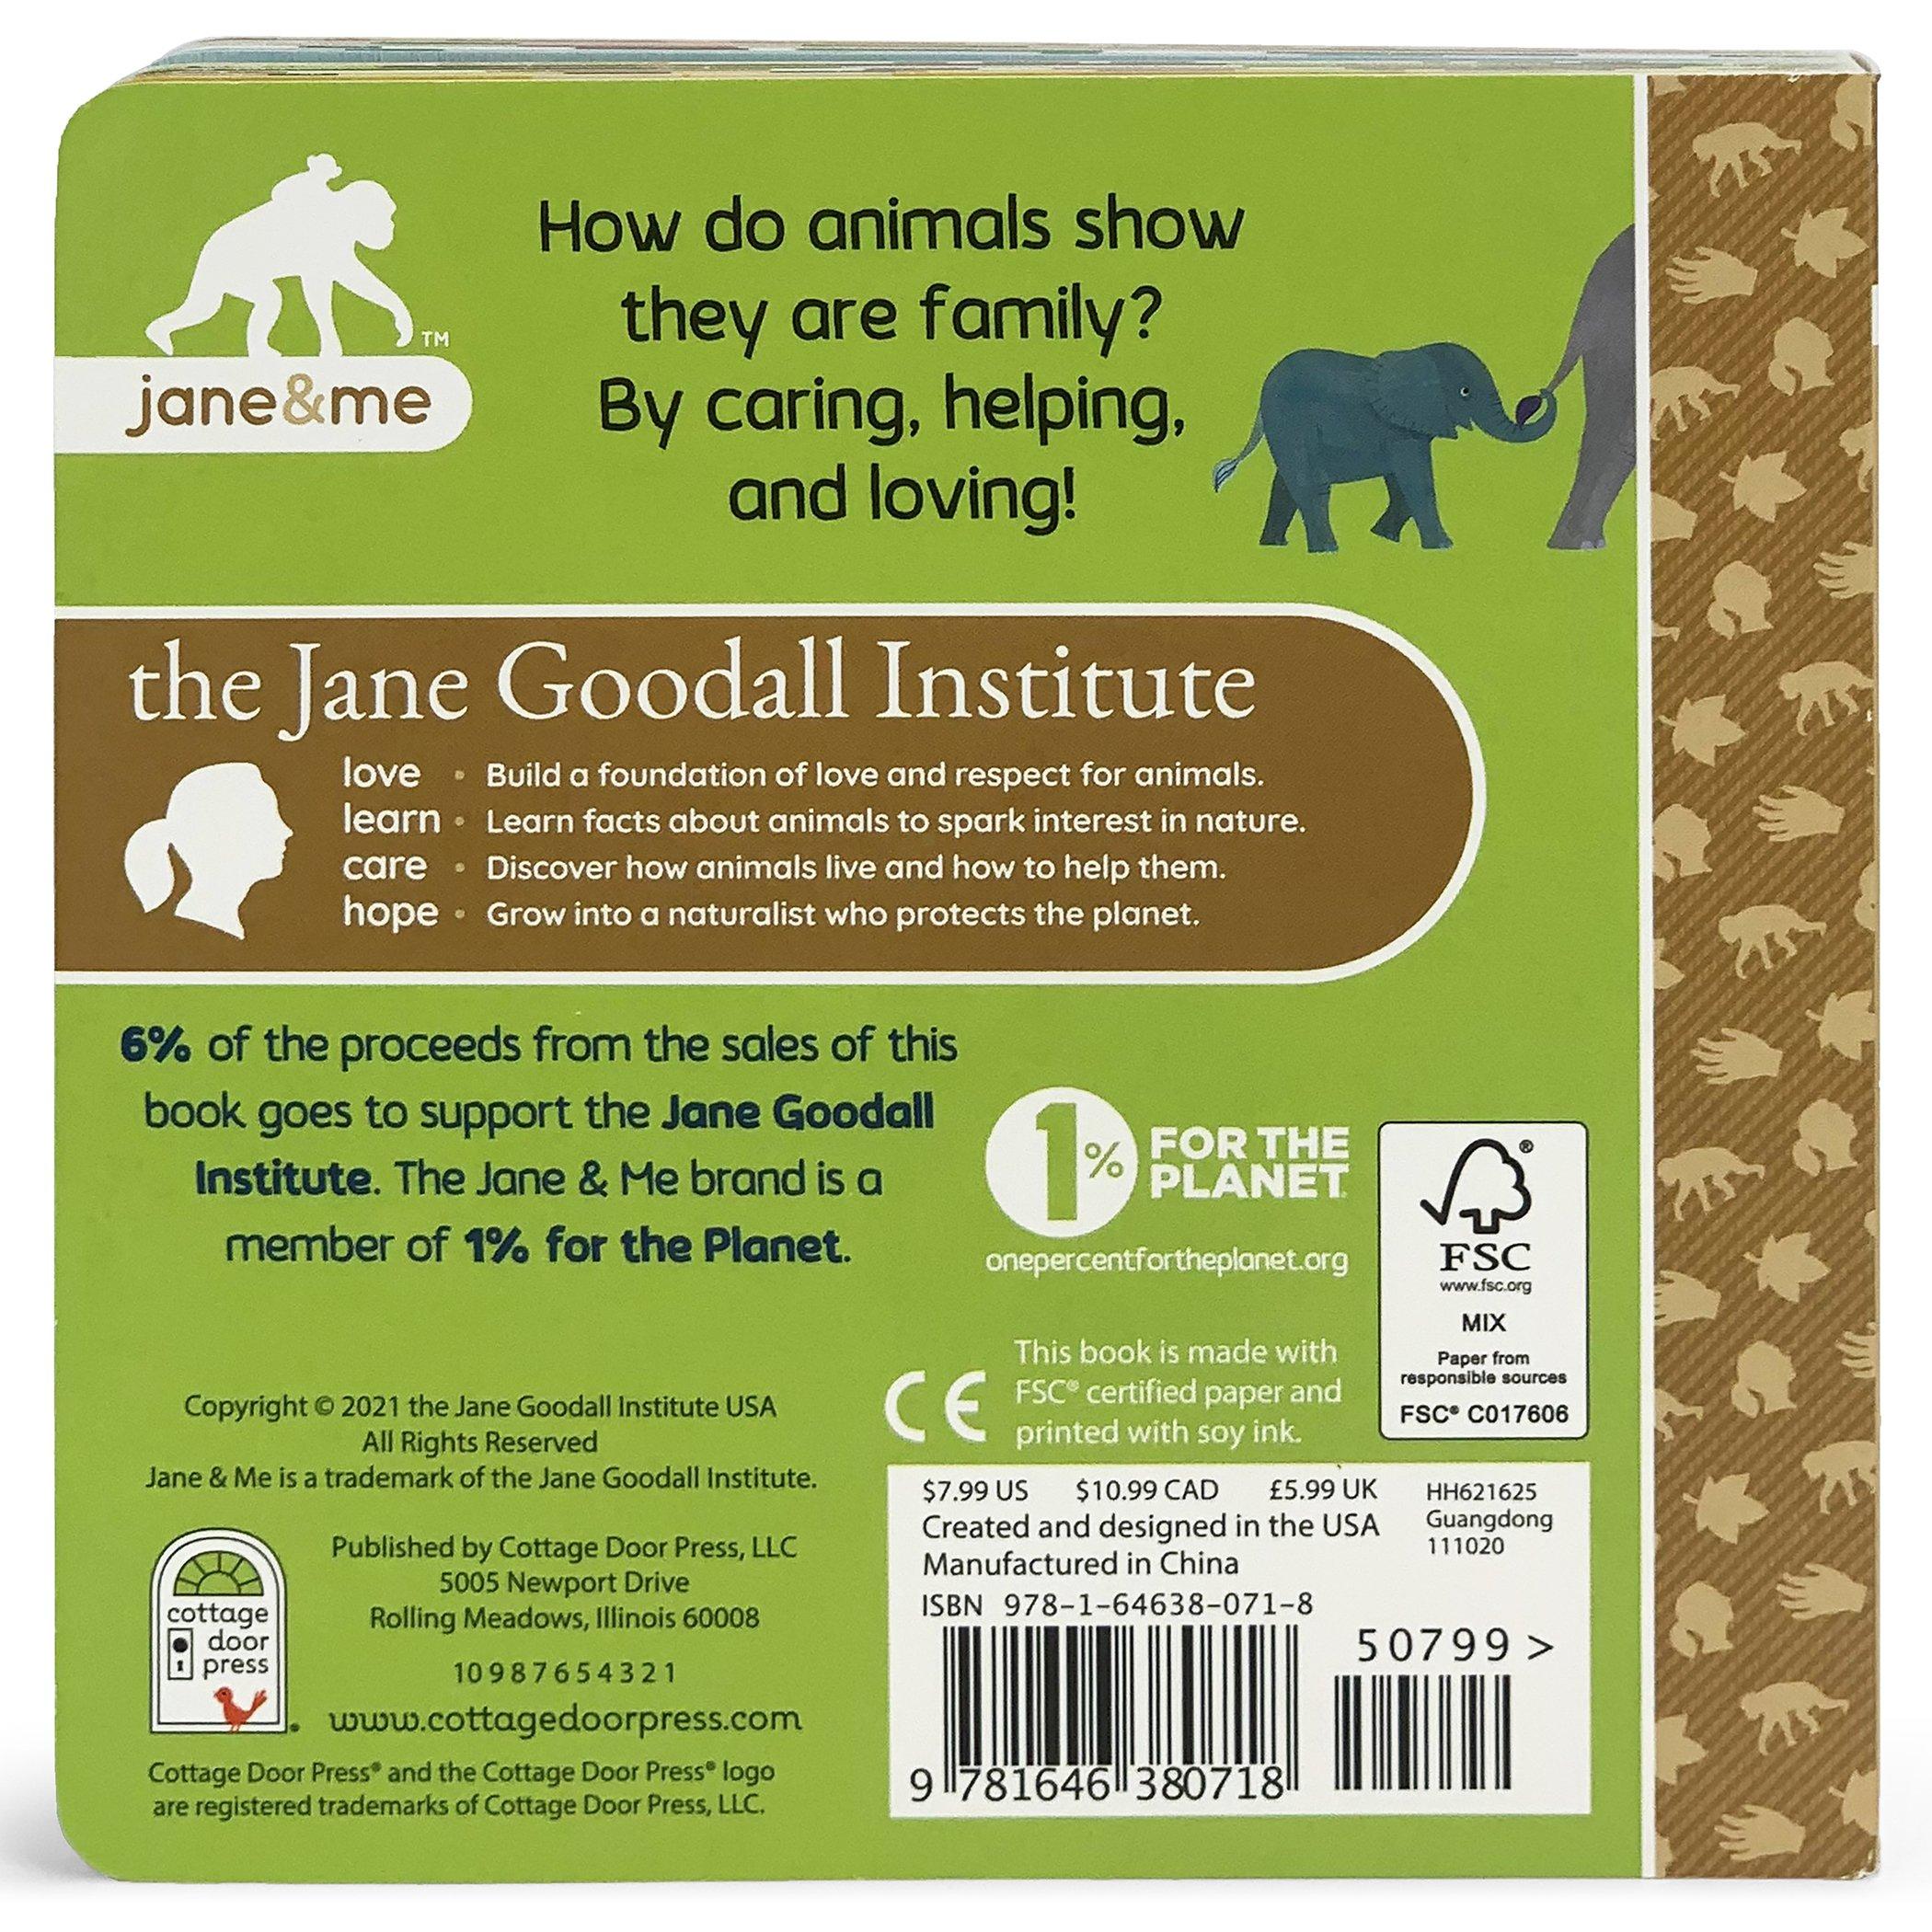 Jane & Me: Family - JGI300